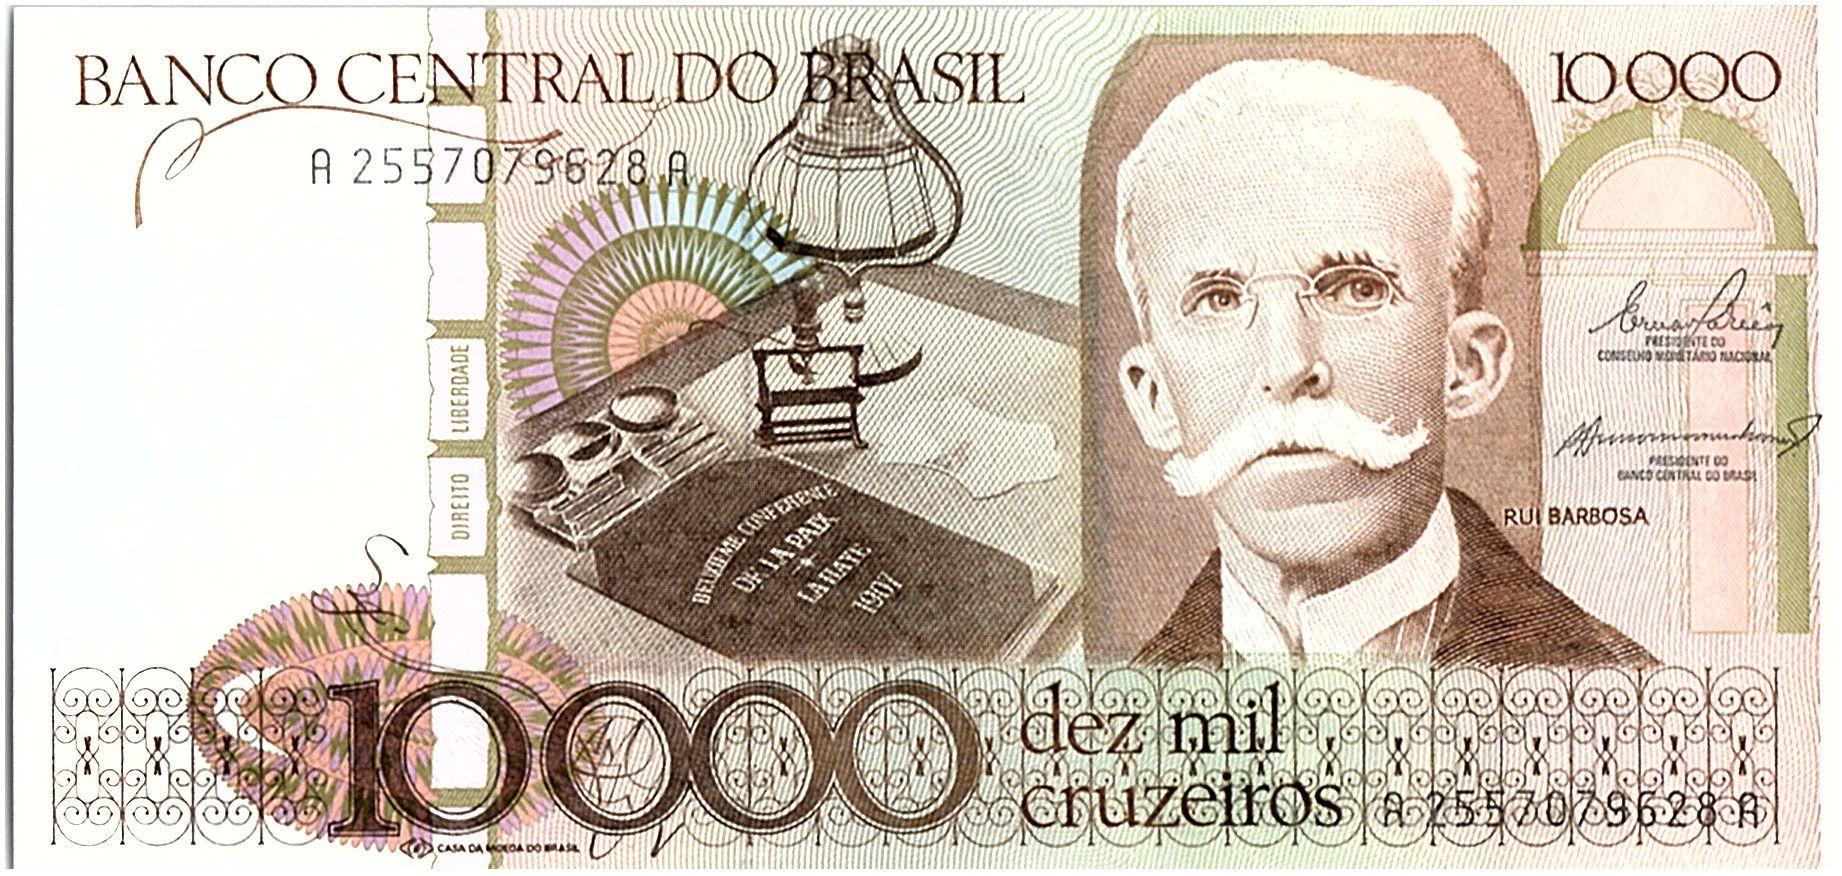 Brésil 10000 Cruzeiros, Rui Barbosa -1984